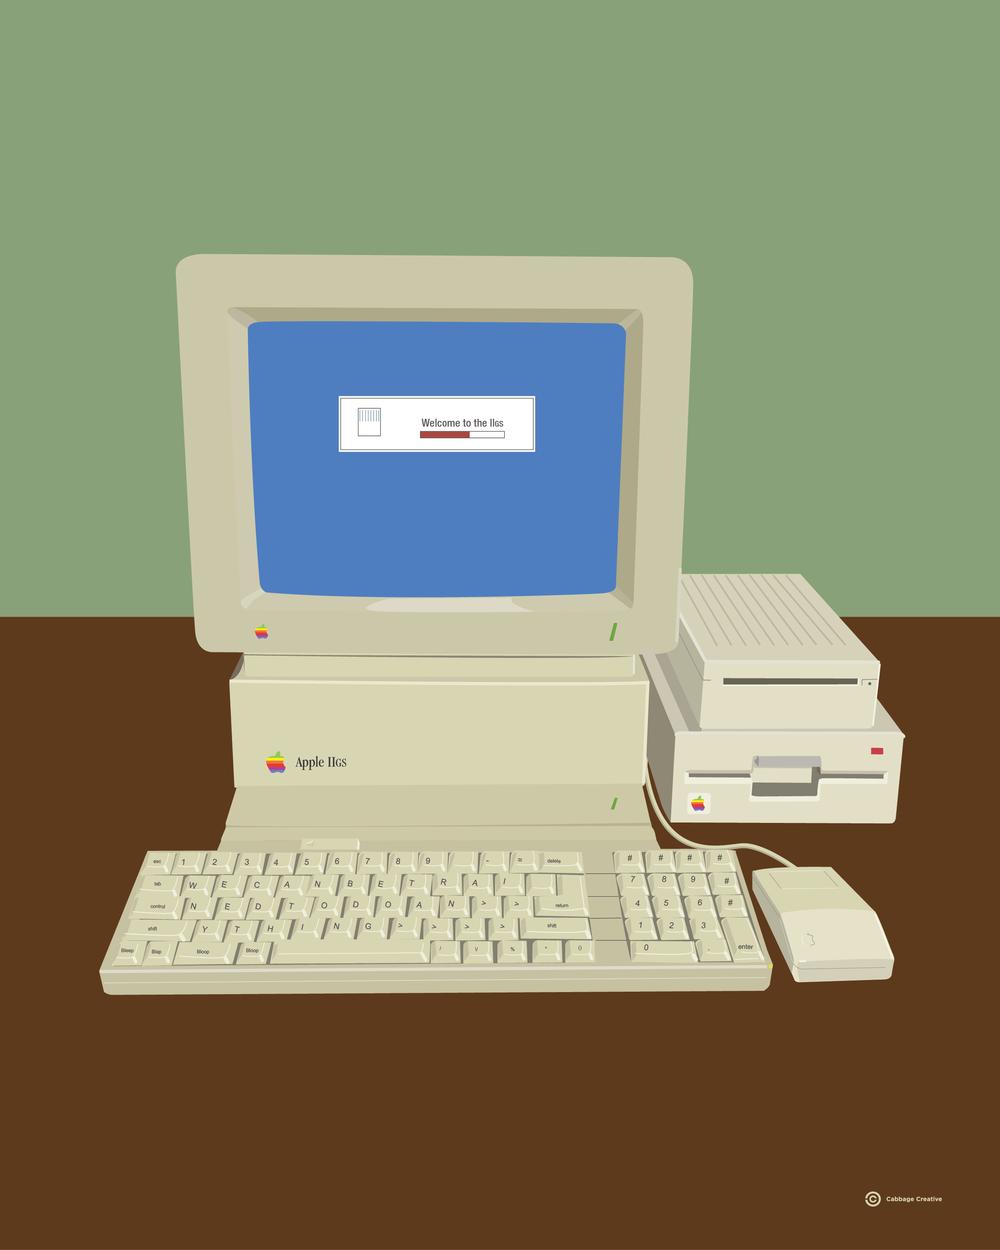 1989:  Apple IIgs